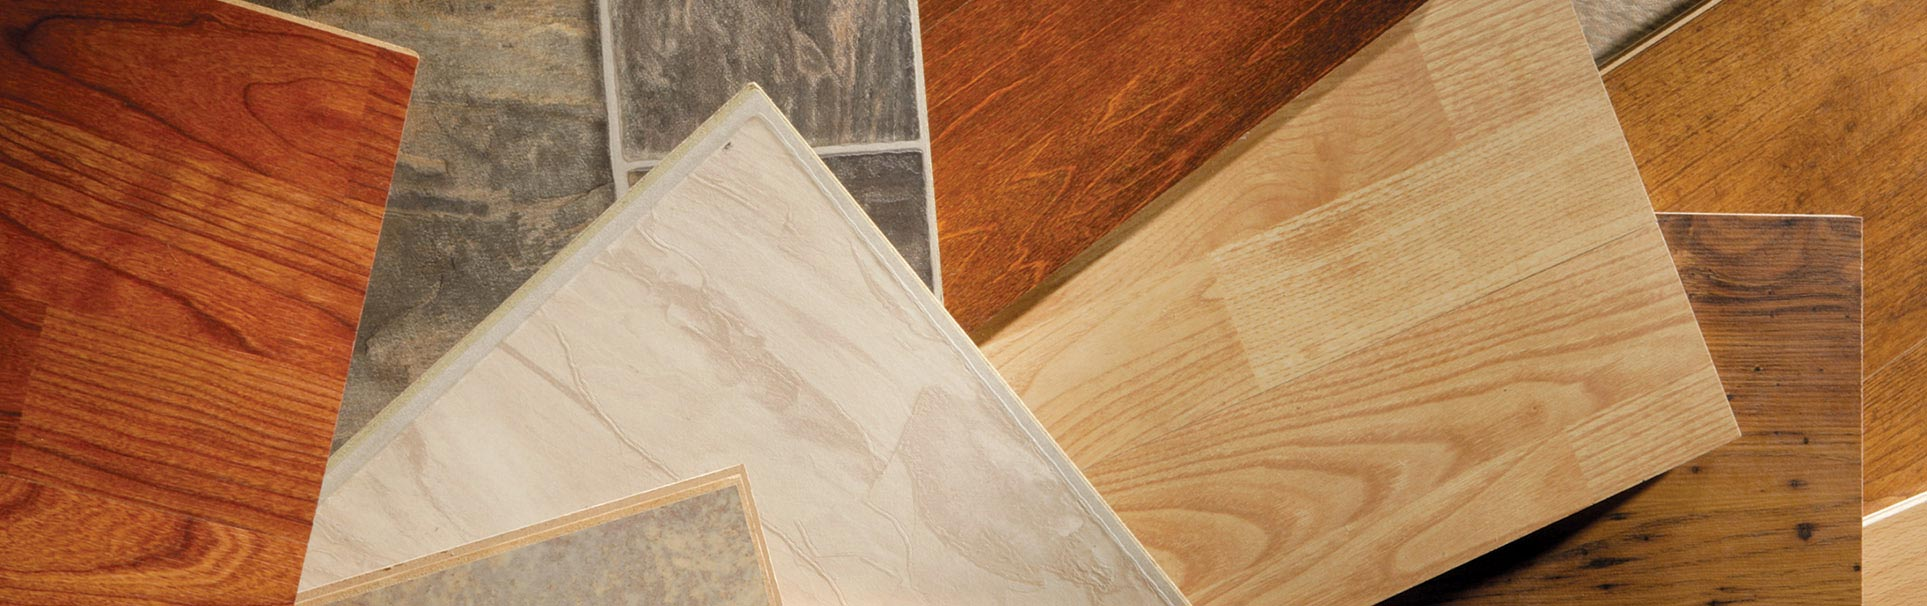 Laminate flooring wood laminated floors twin cities mn for Laminate flooring mn